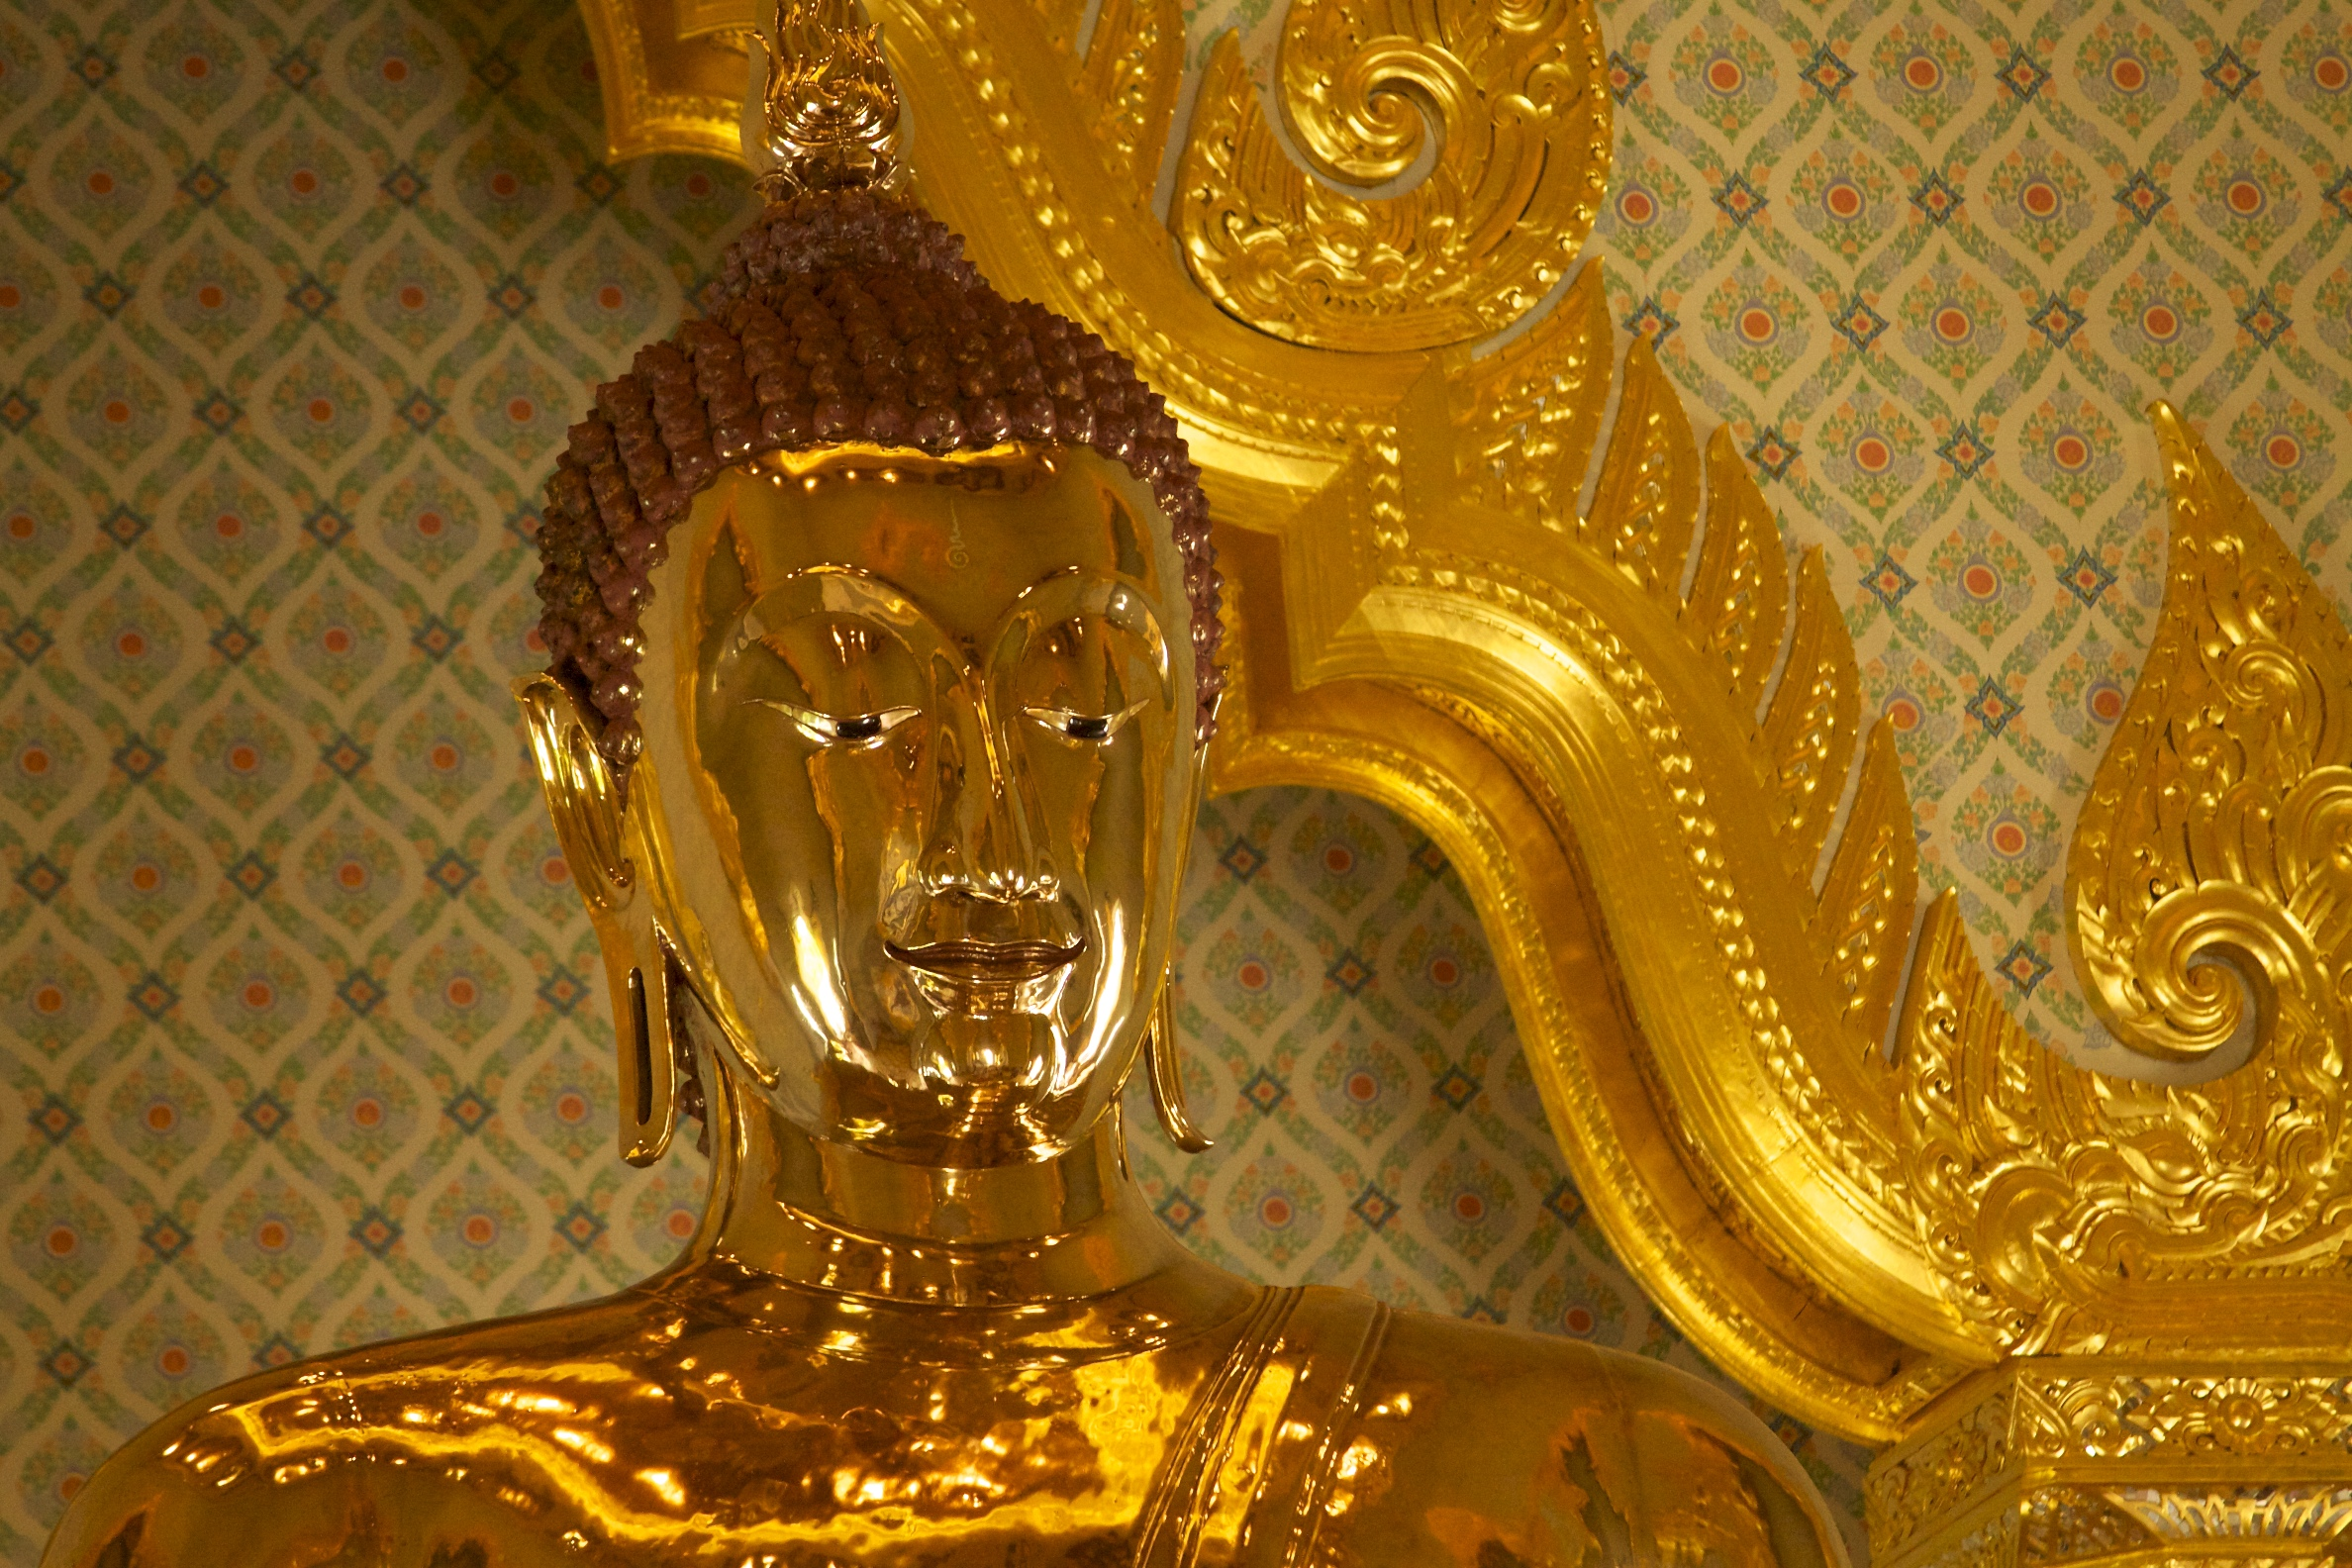 File:Golden Buddha at Wat Traimit (6491905489).jpg - Wikimedia Commons